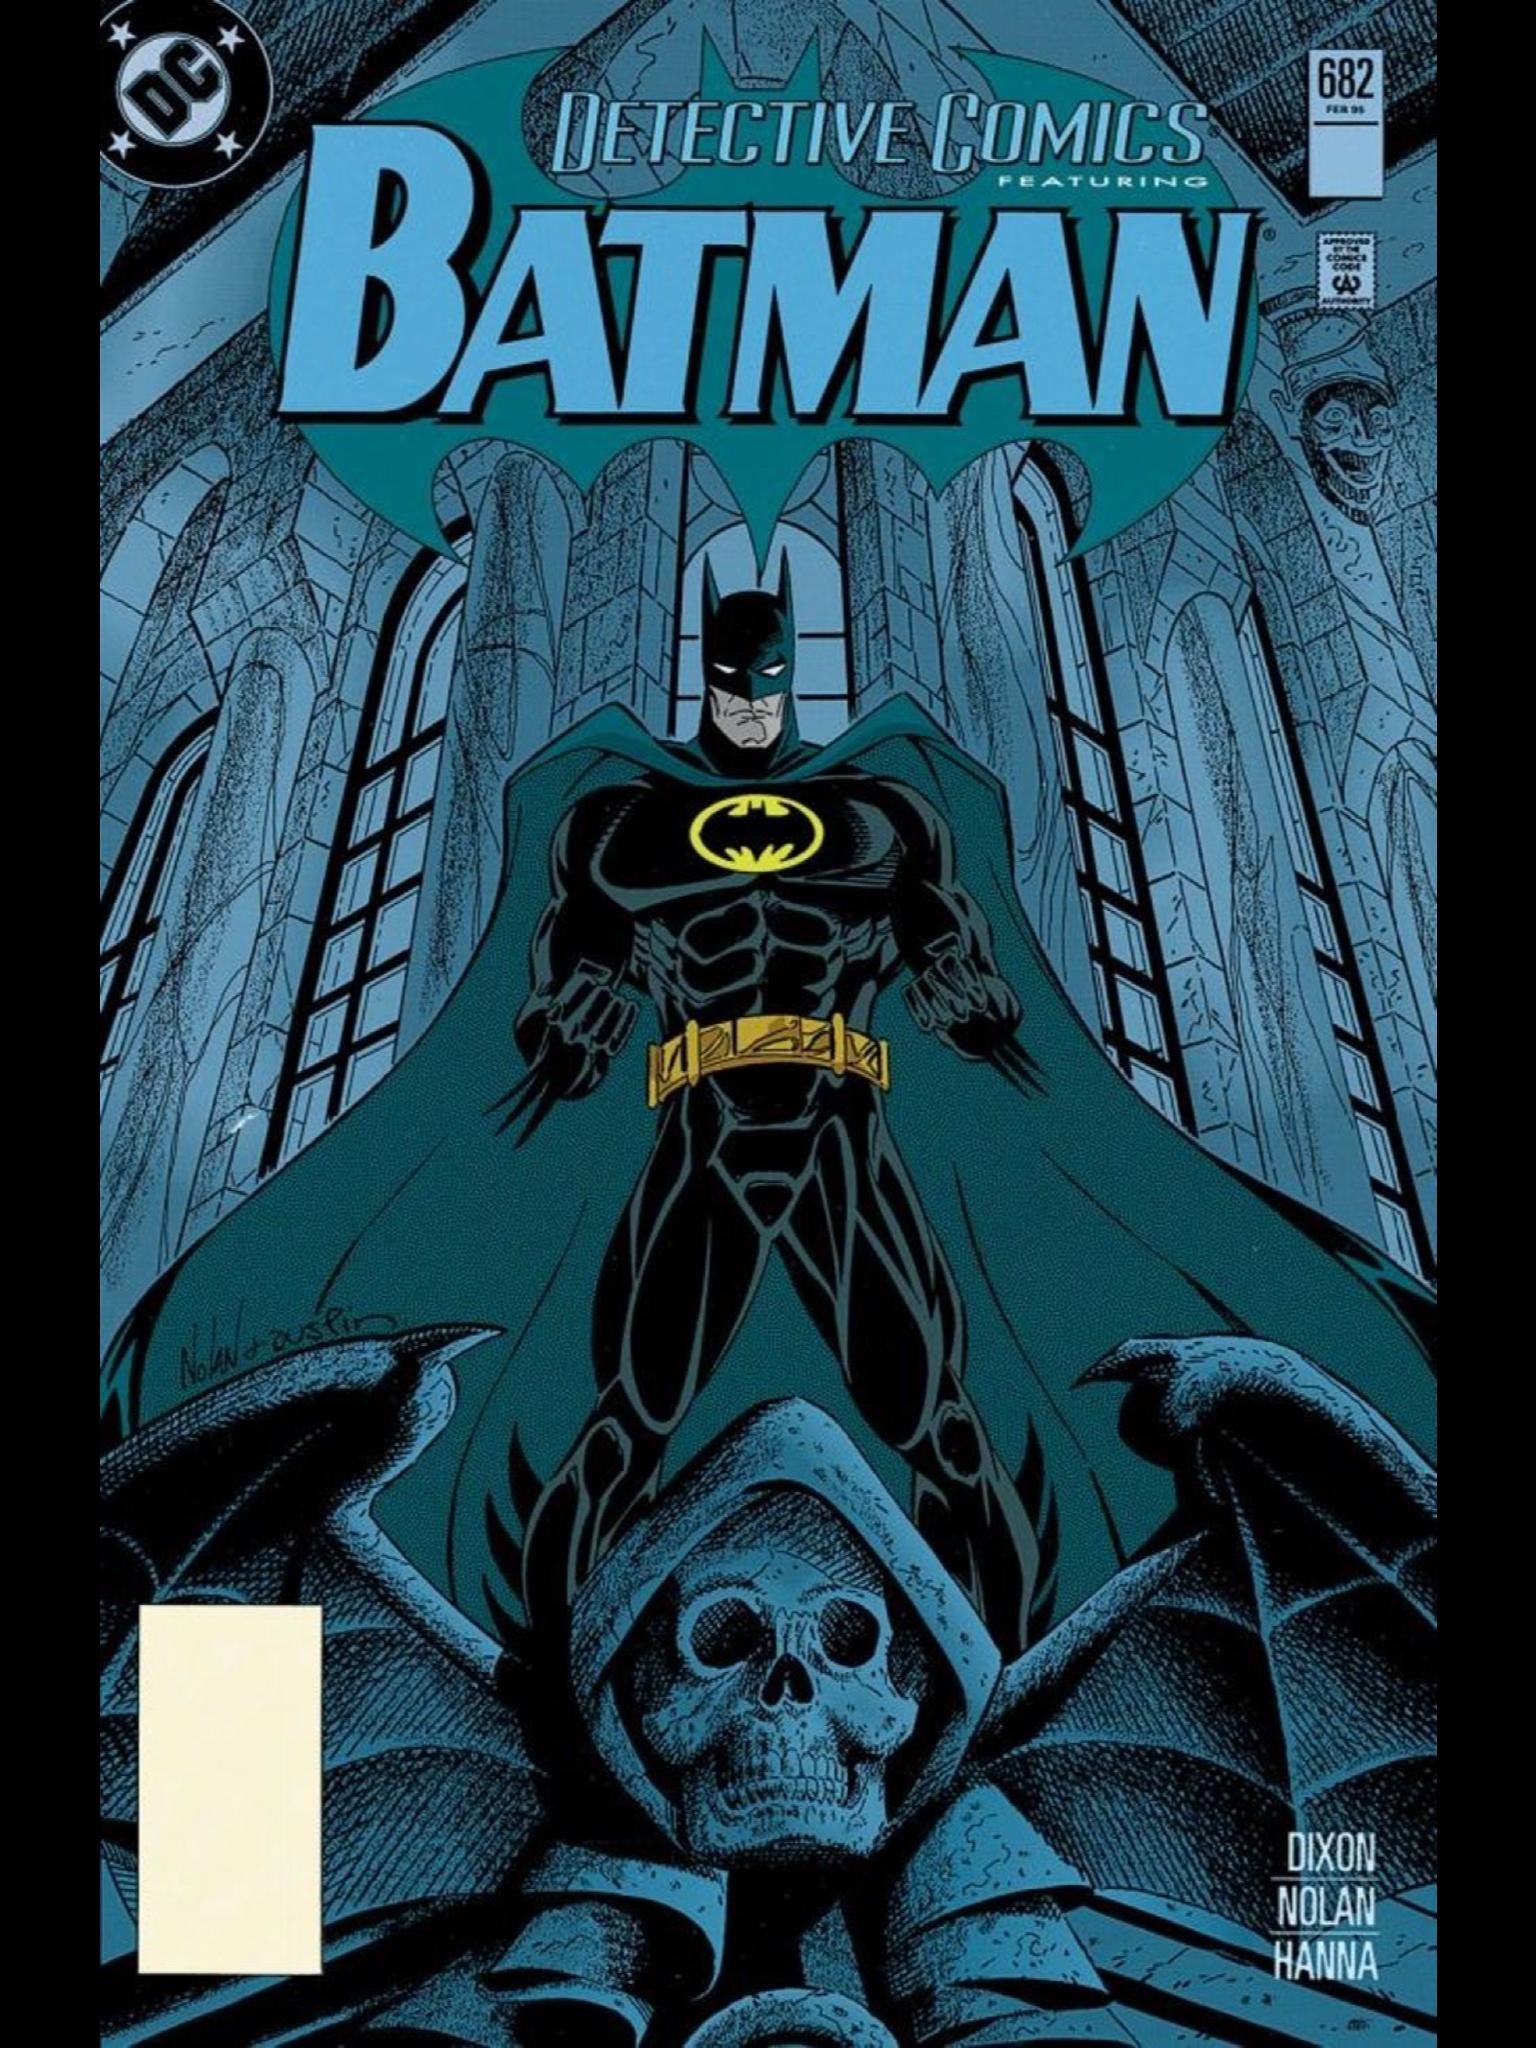 Pin by hil mat on Batman   Batman, Detective comics ...